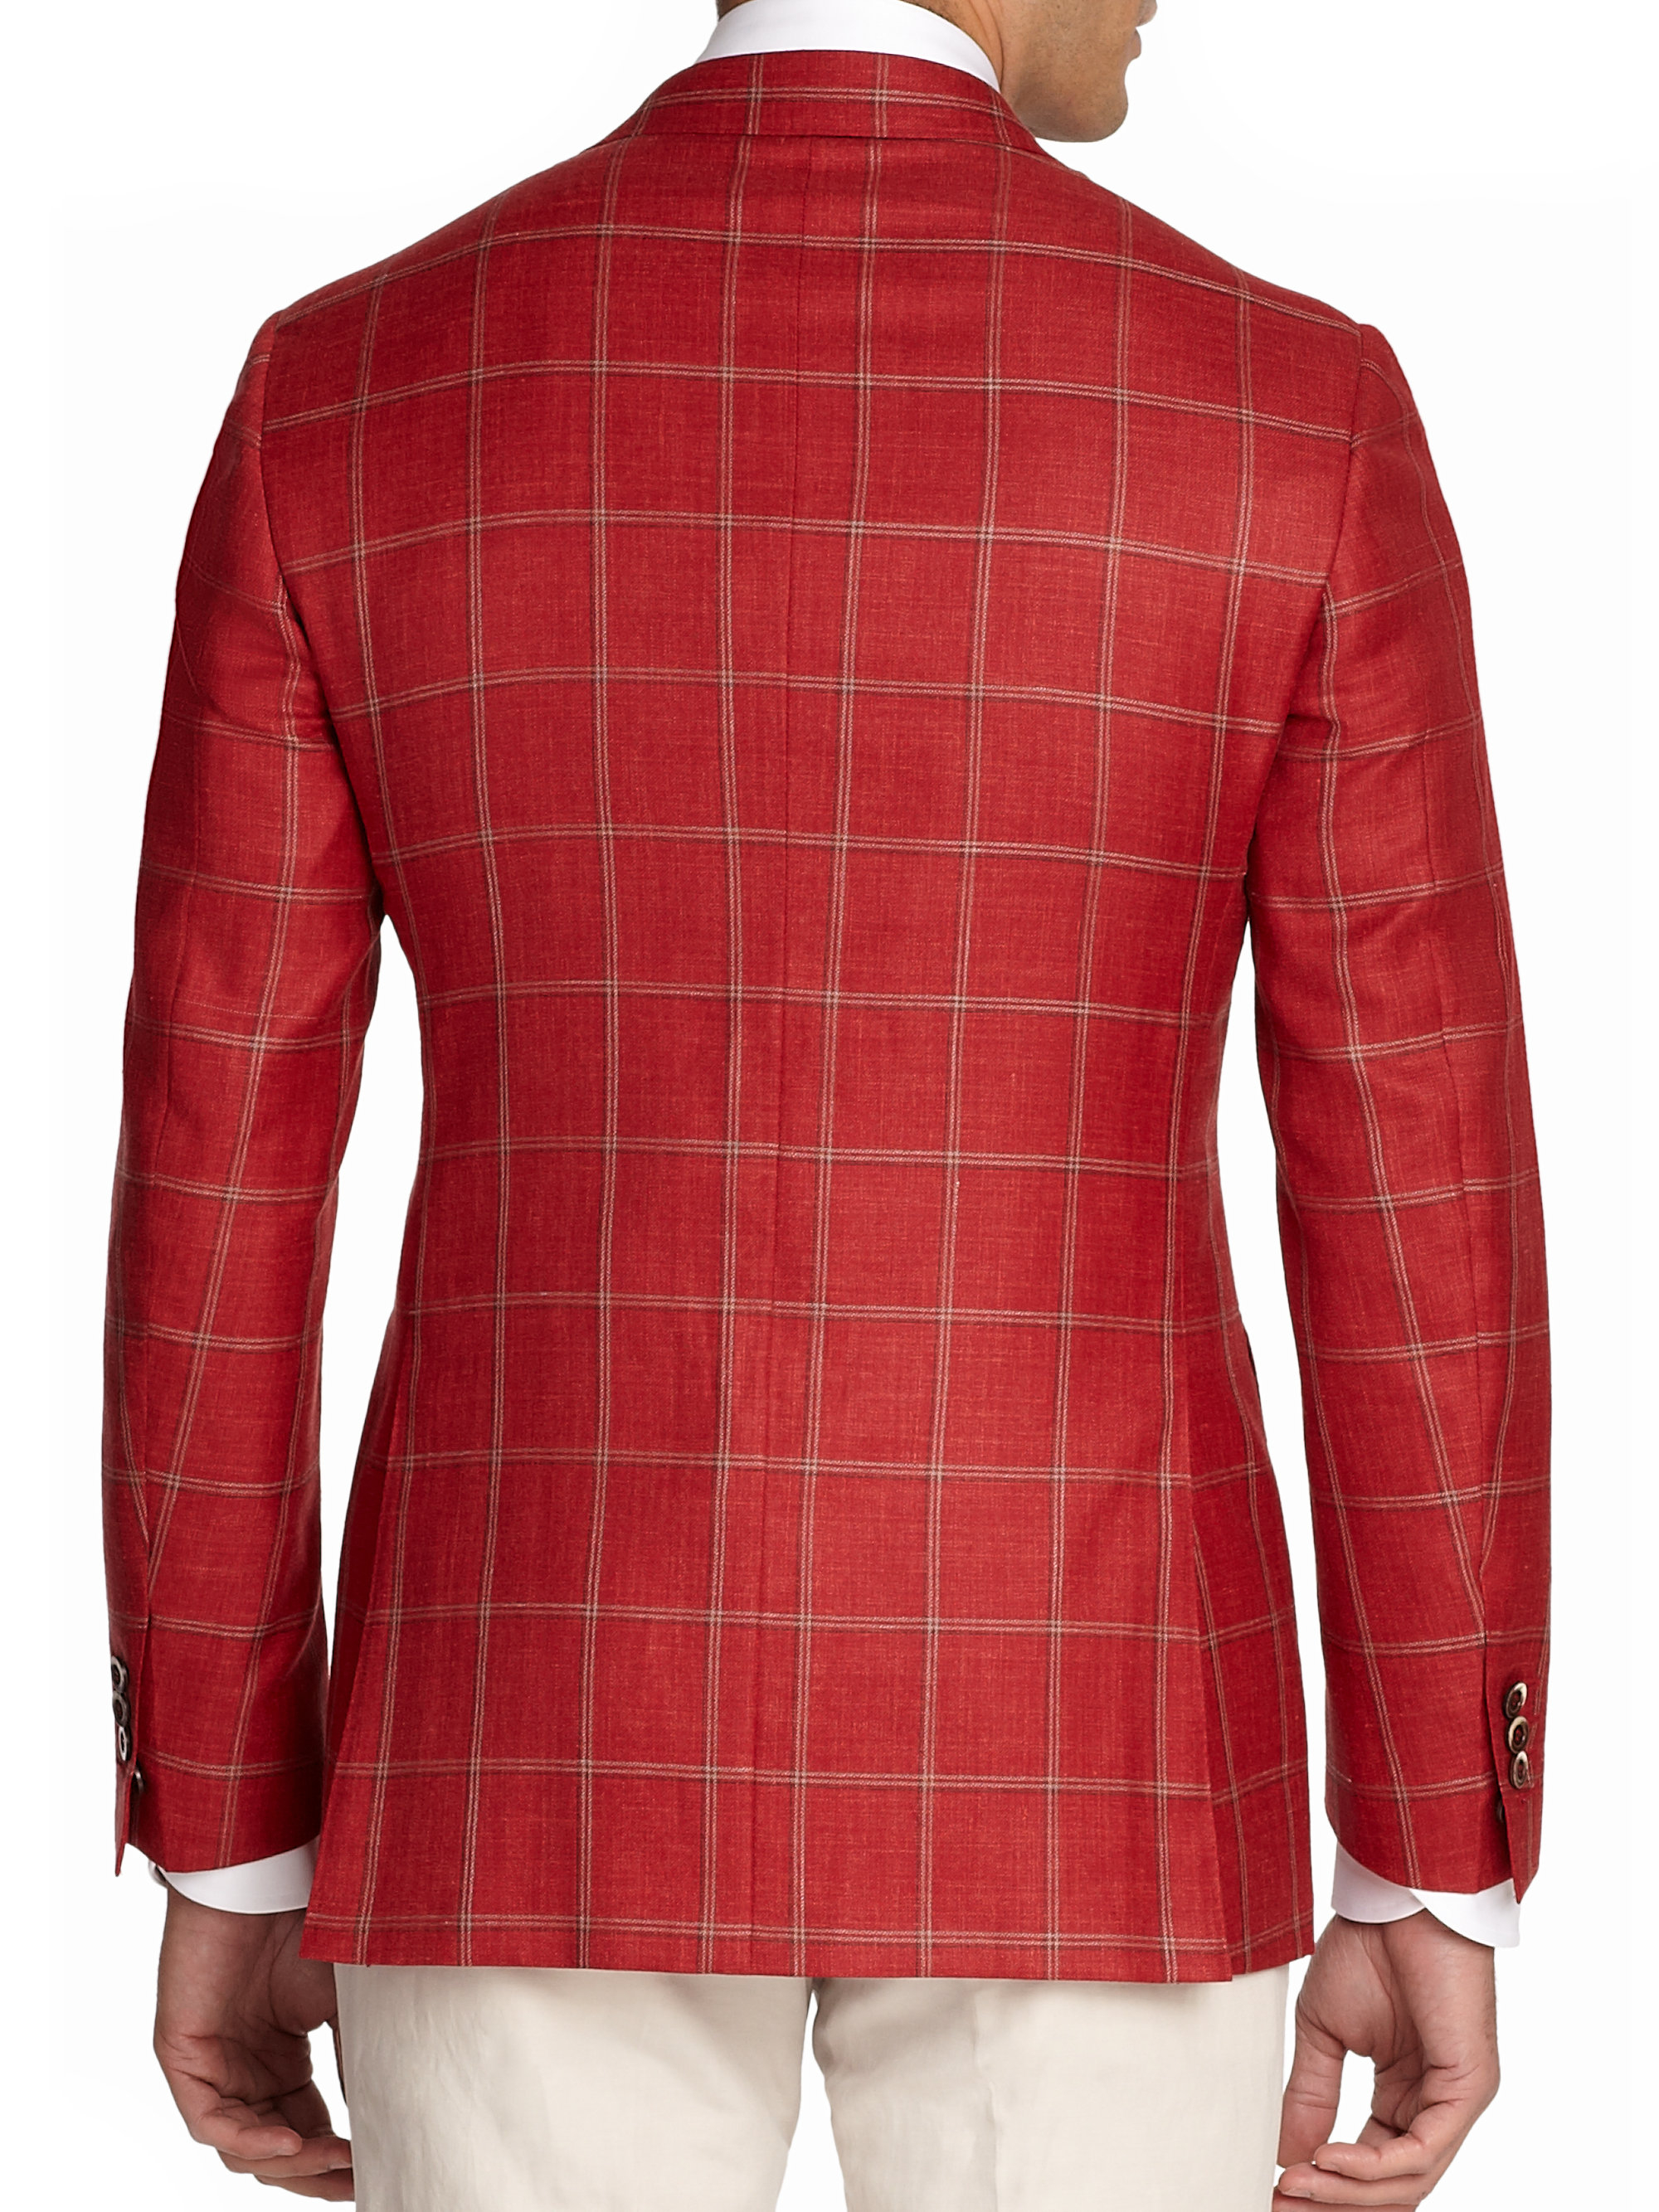 Blazer Jackets For Men